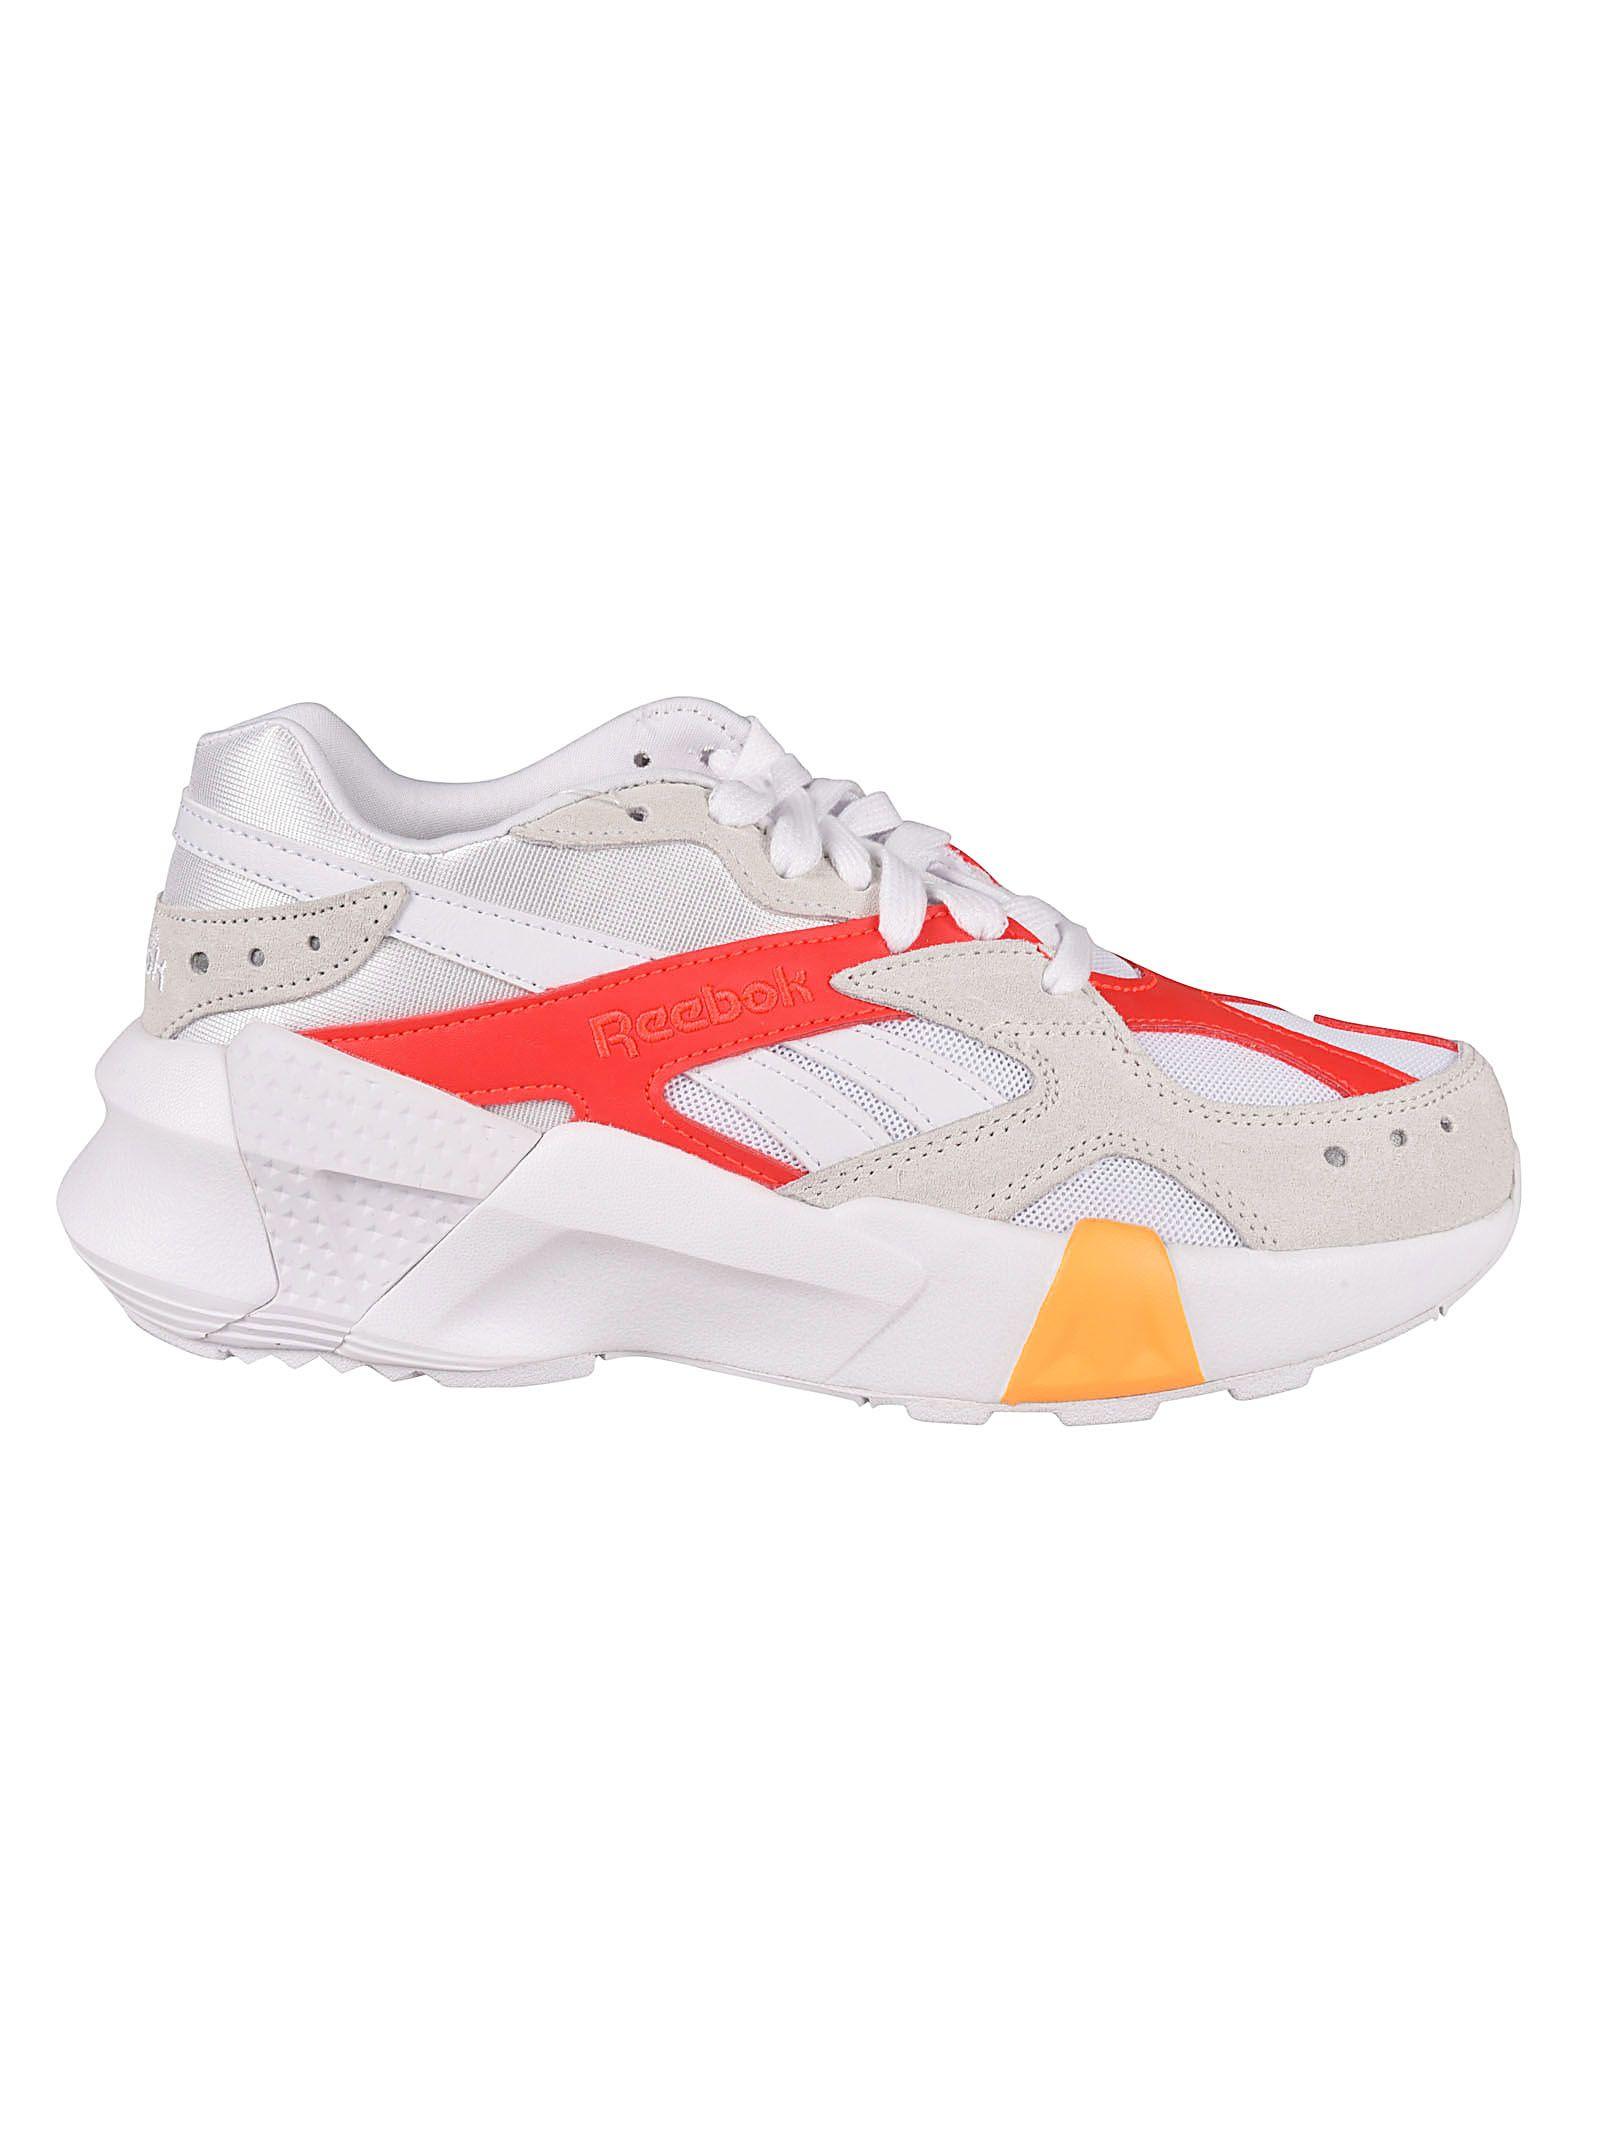 4e898a3eb96 Reebok Reebok Aztrek Double X Gigi Hadid Sneakers - Multicolor ...